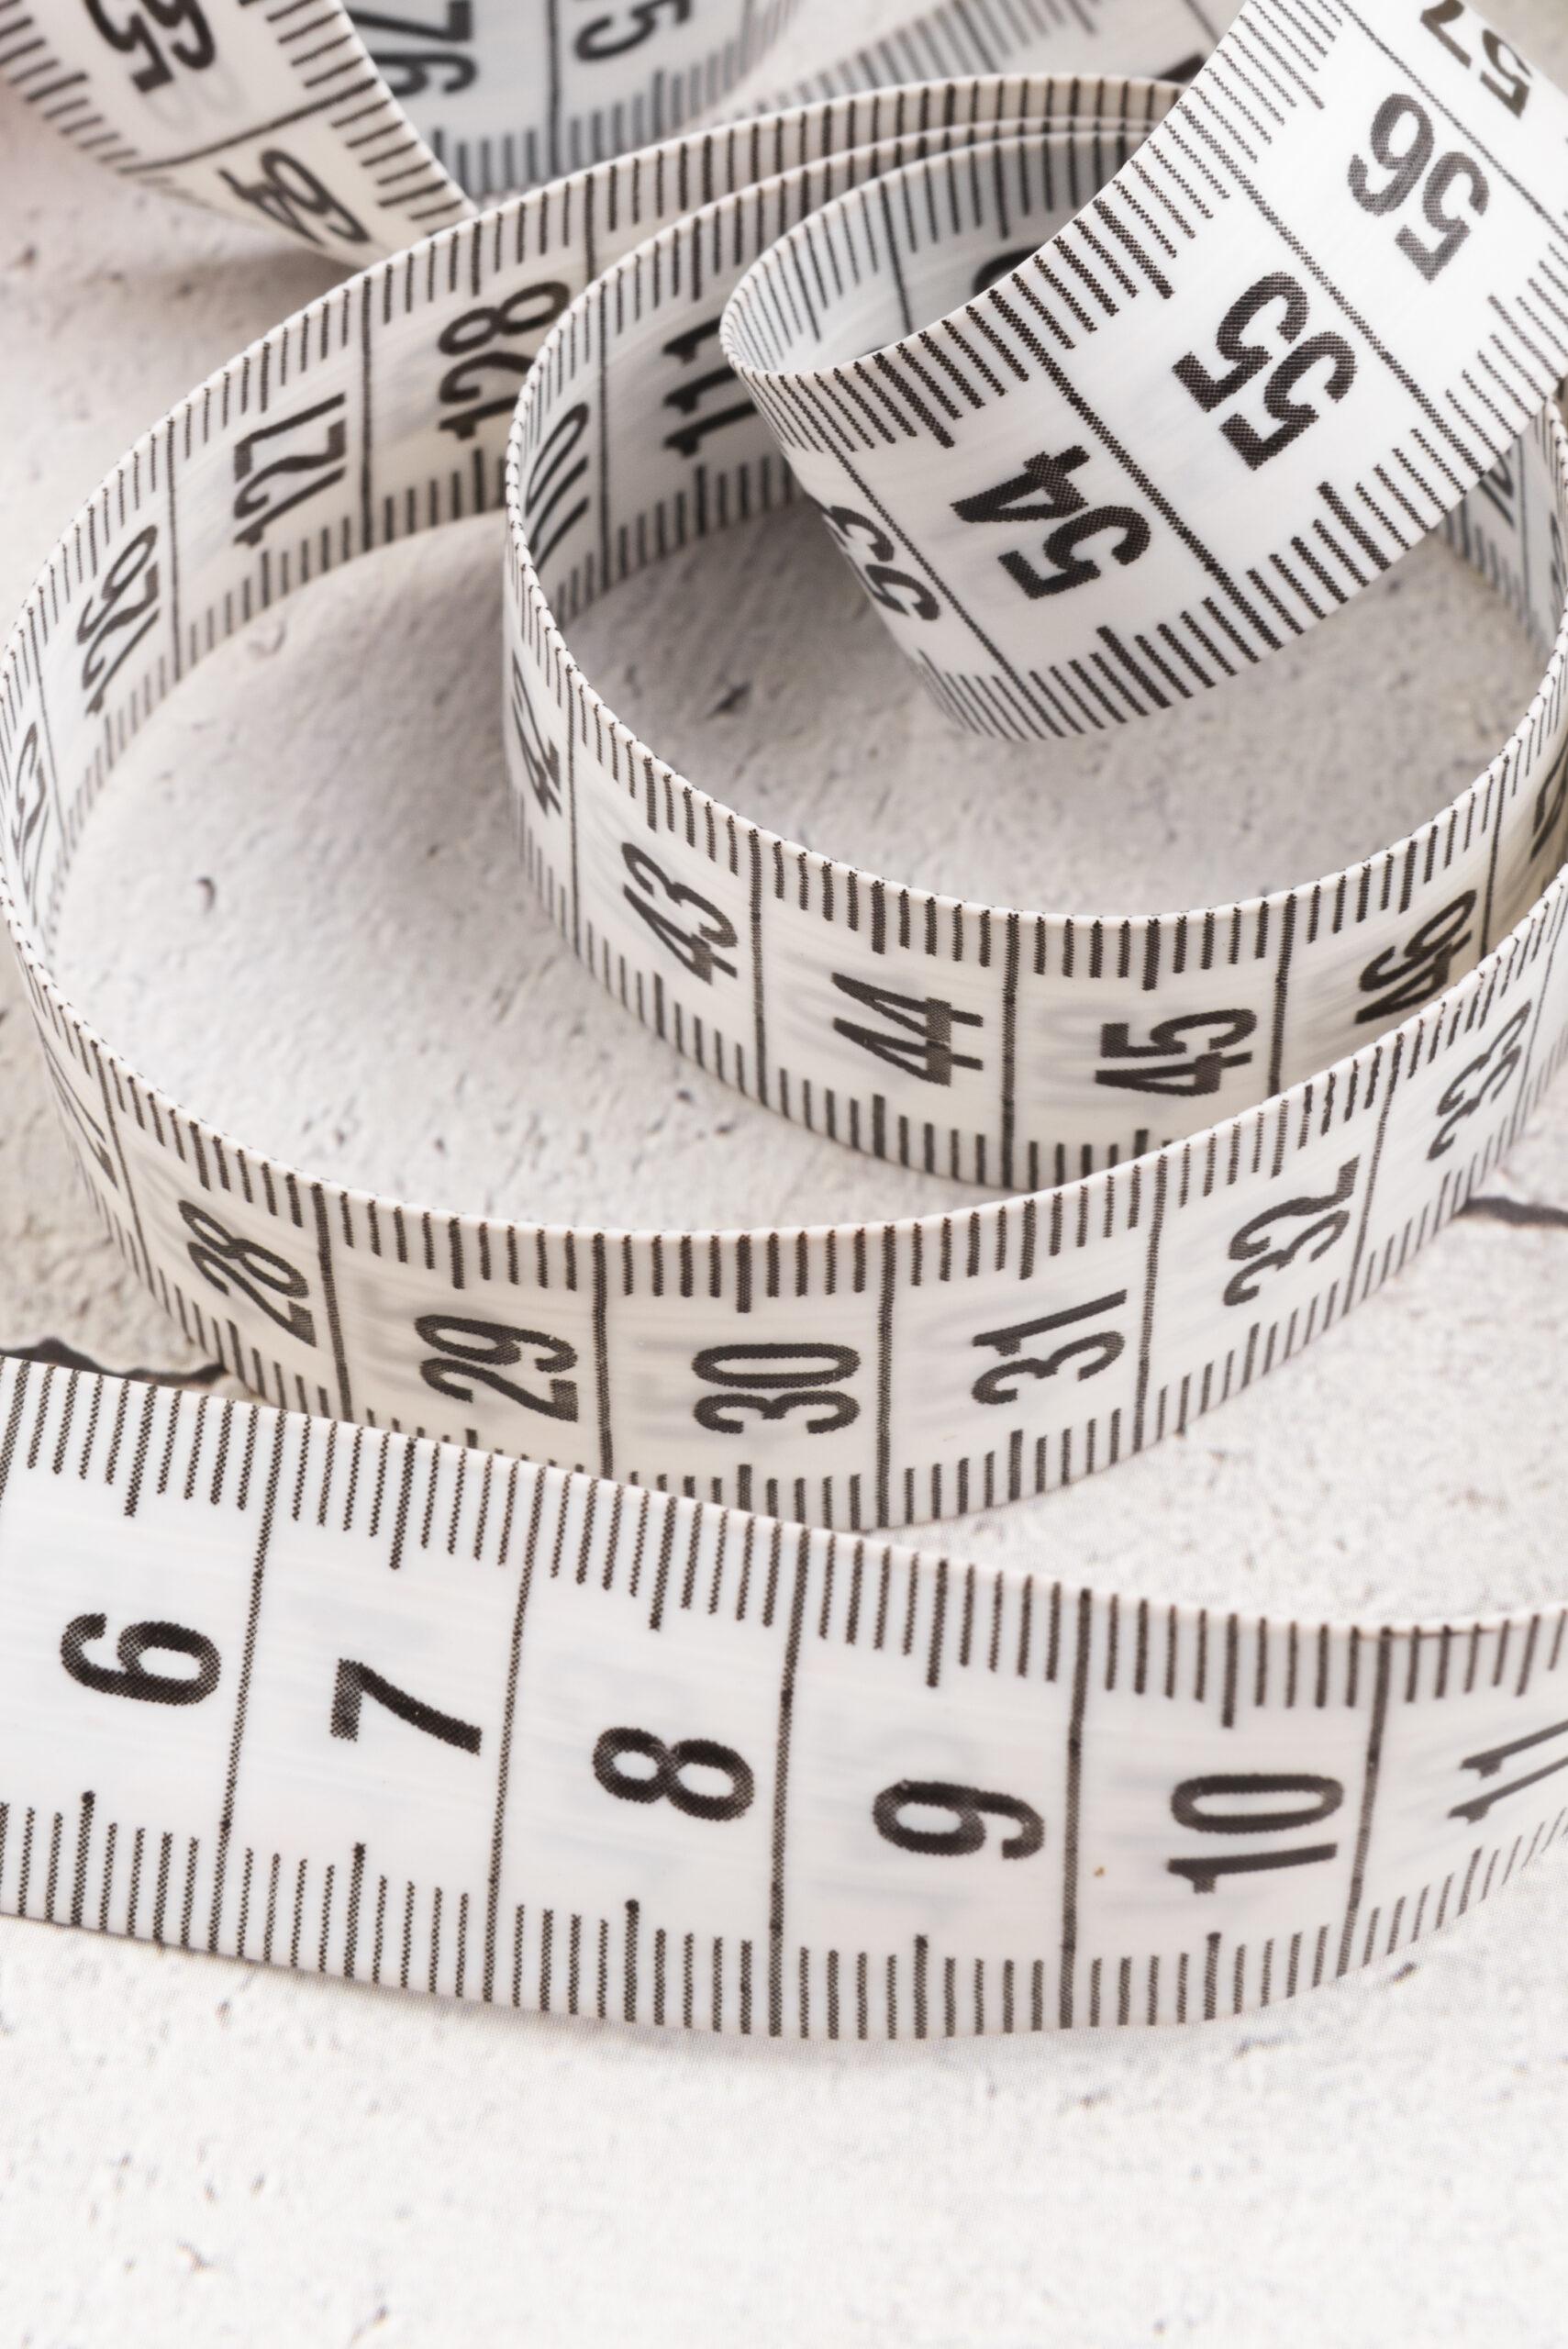 metre, inch, uzunluk